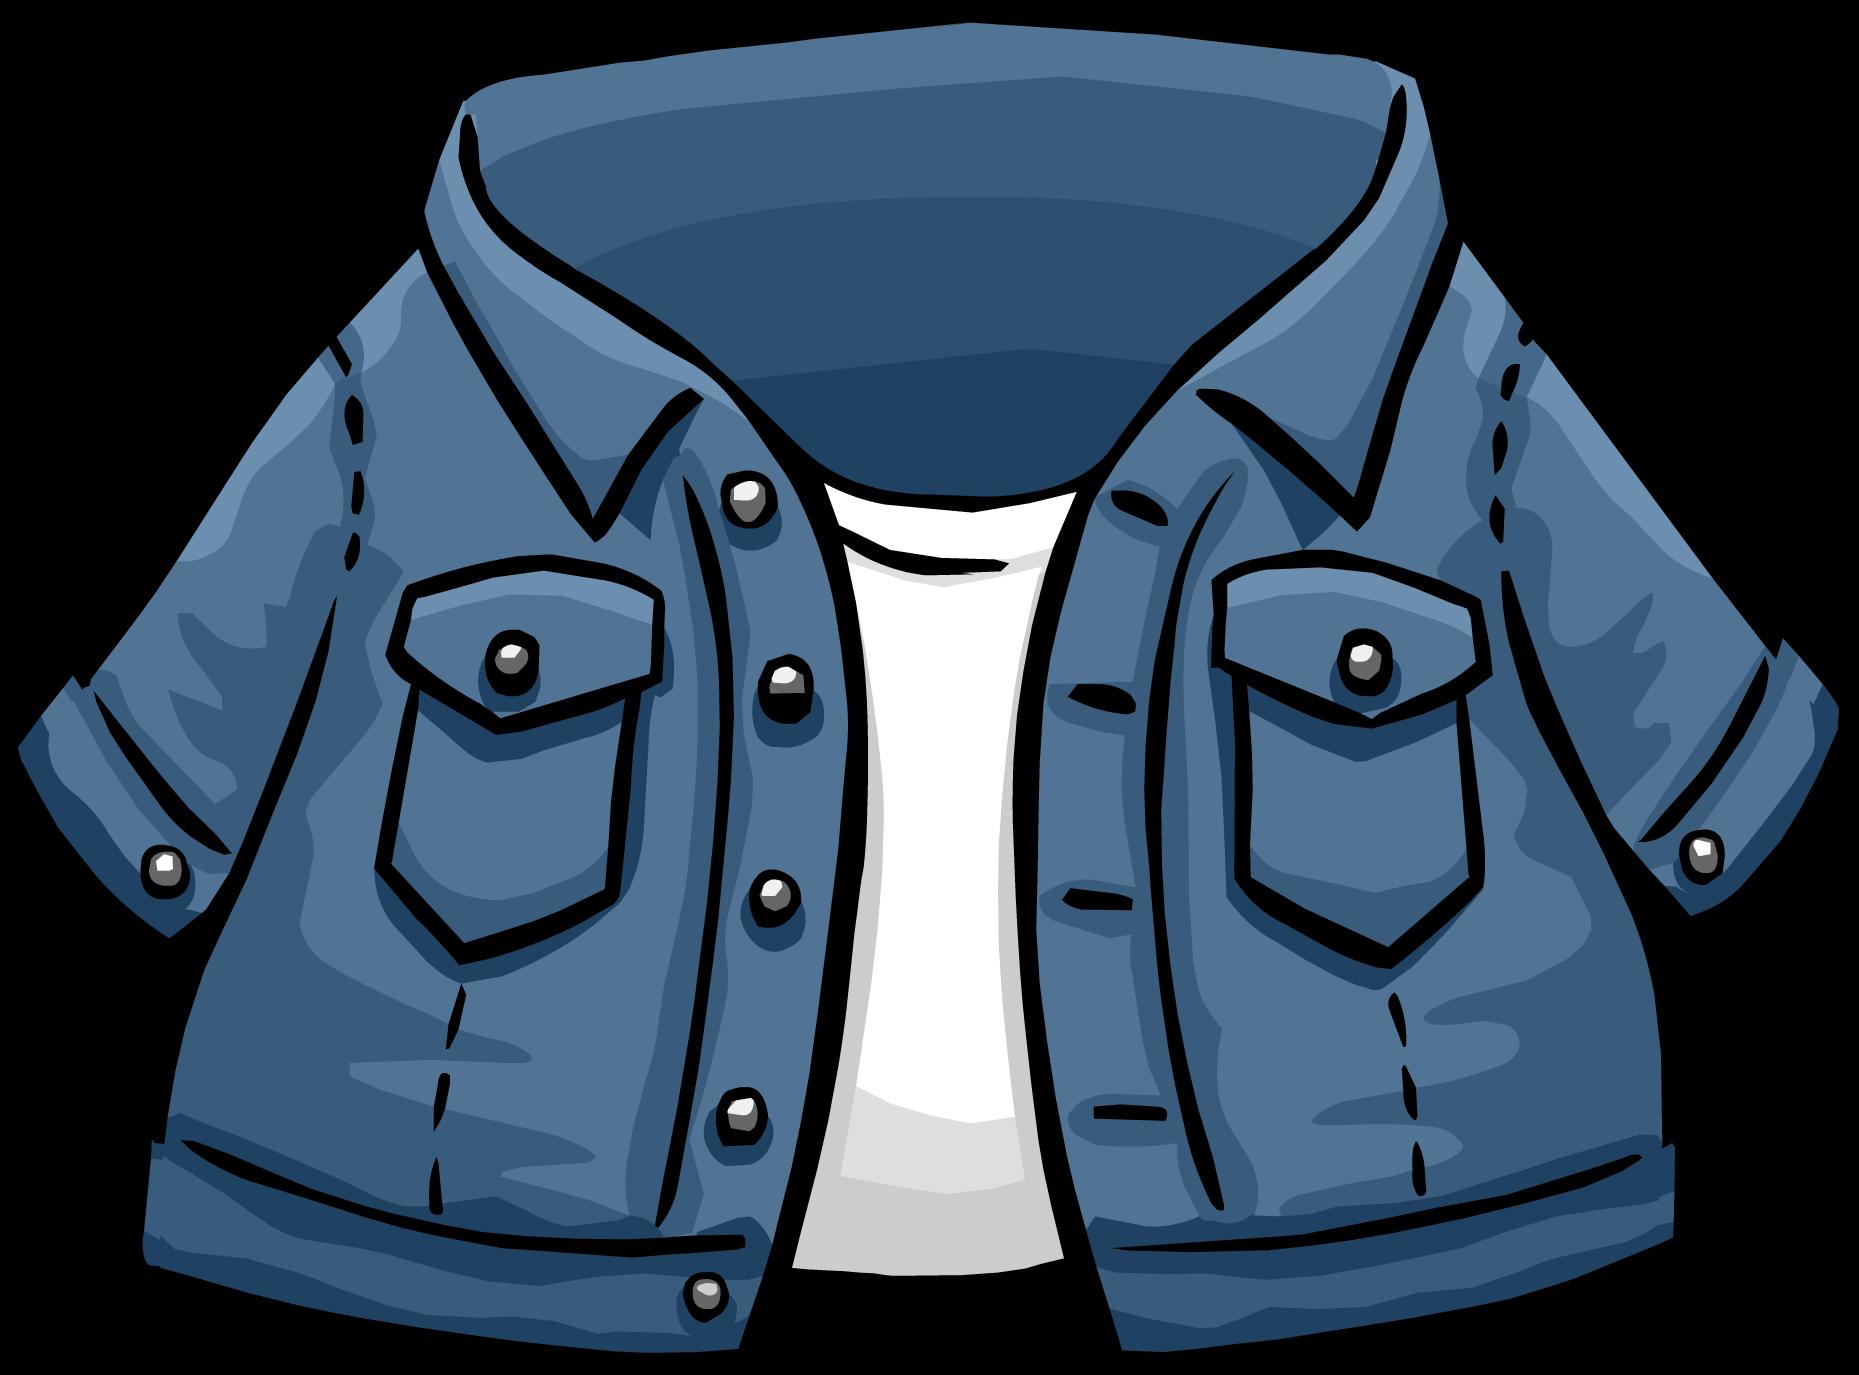 Jacket basketball clipart clip art freeuse stock Uniform Clipart jacket - Free Clipart on Dumielauxepices.net clip art freeuse stock